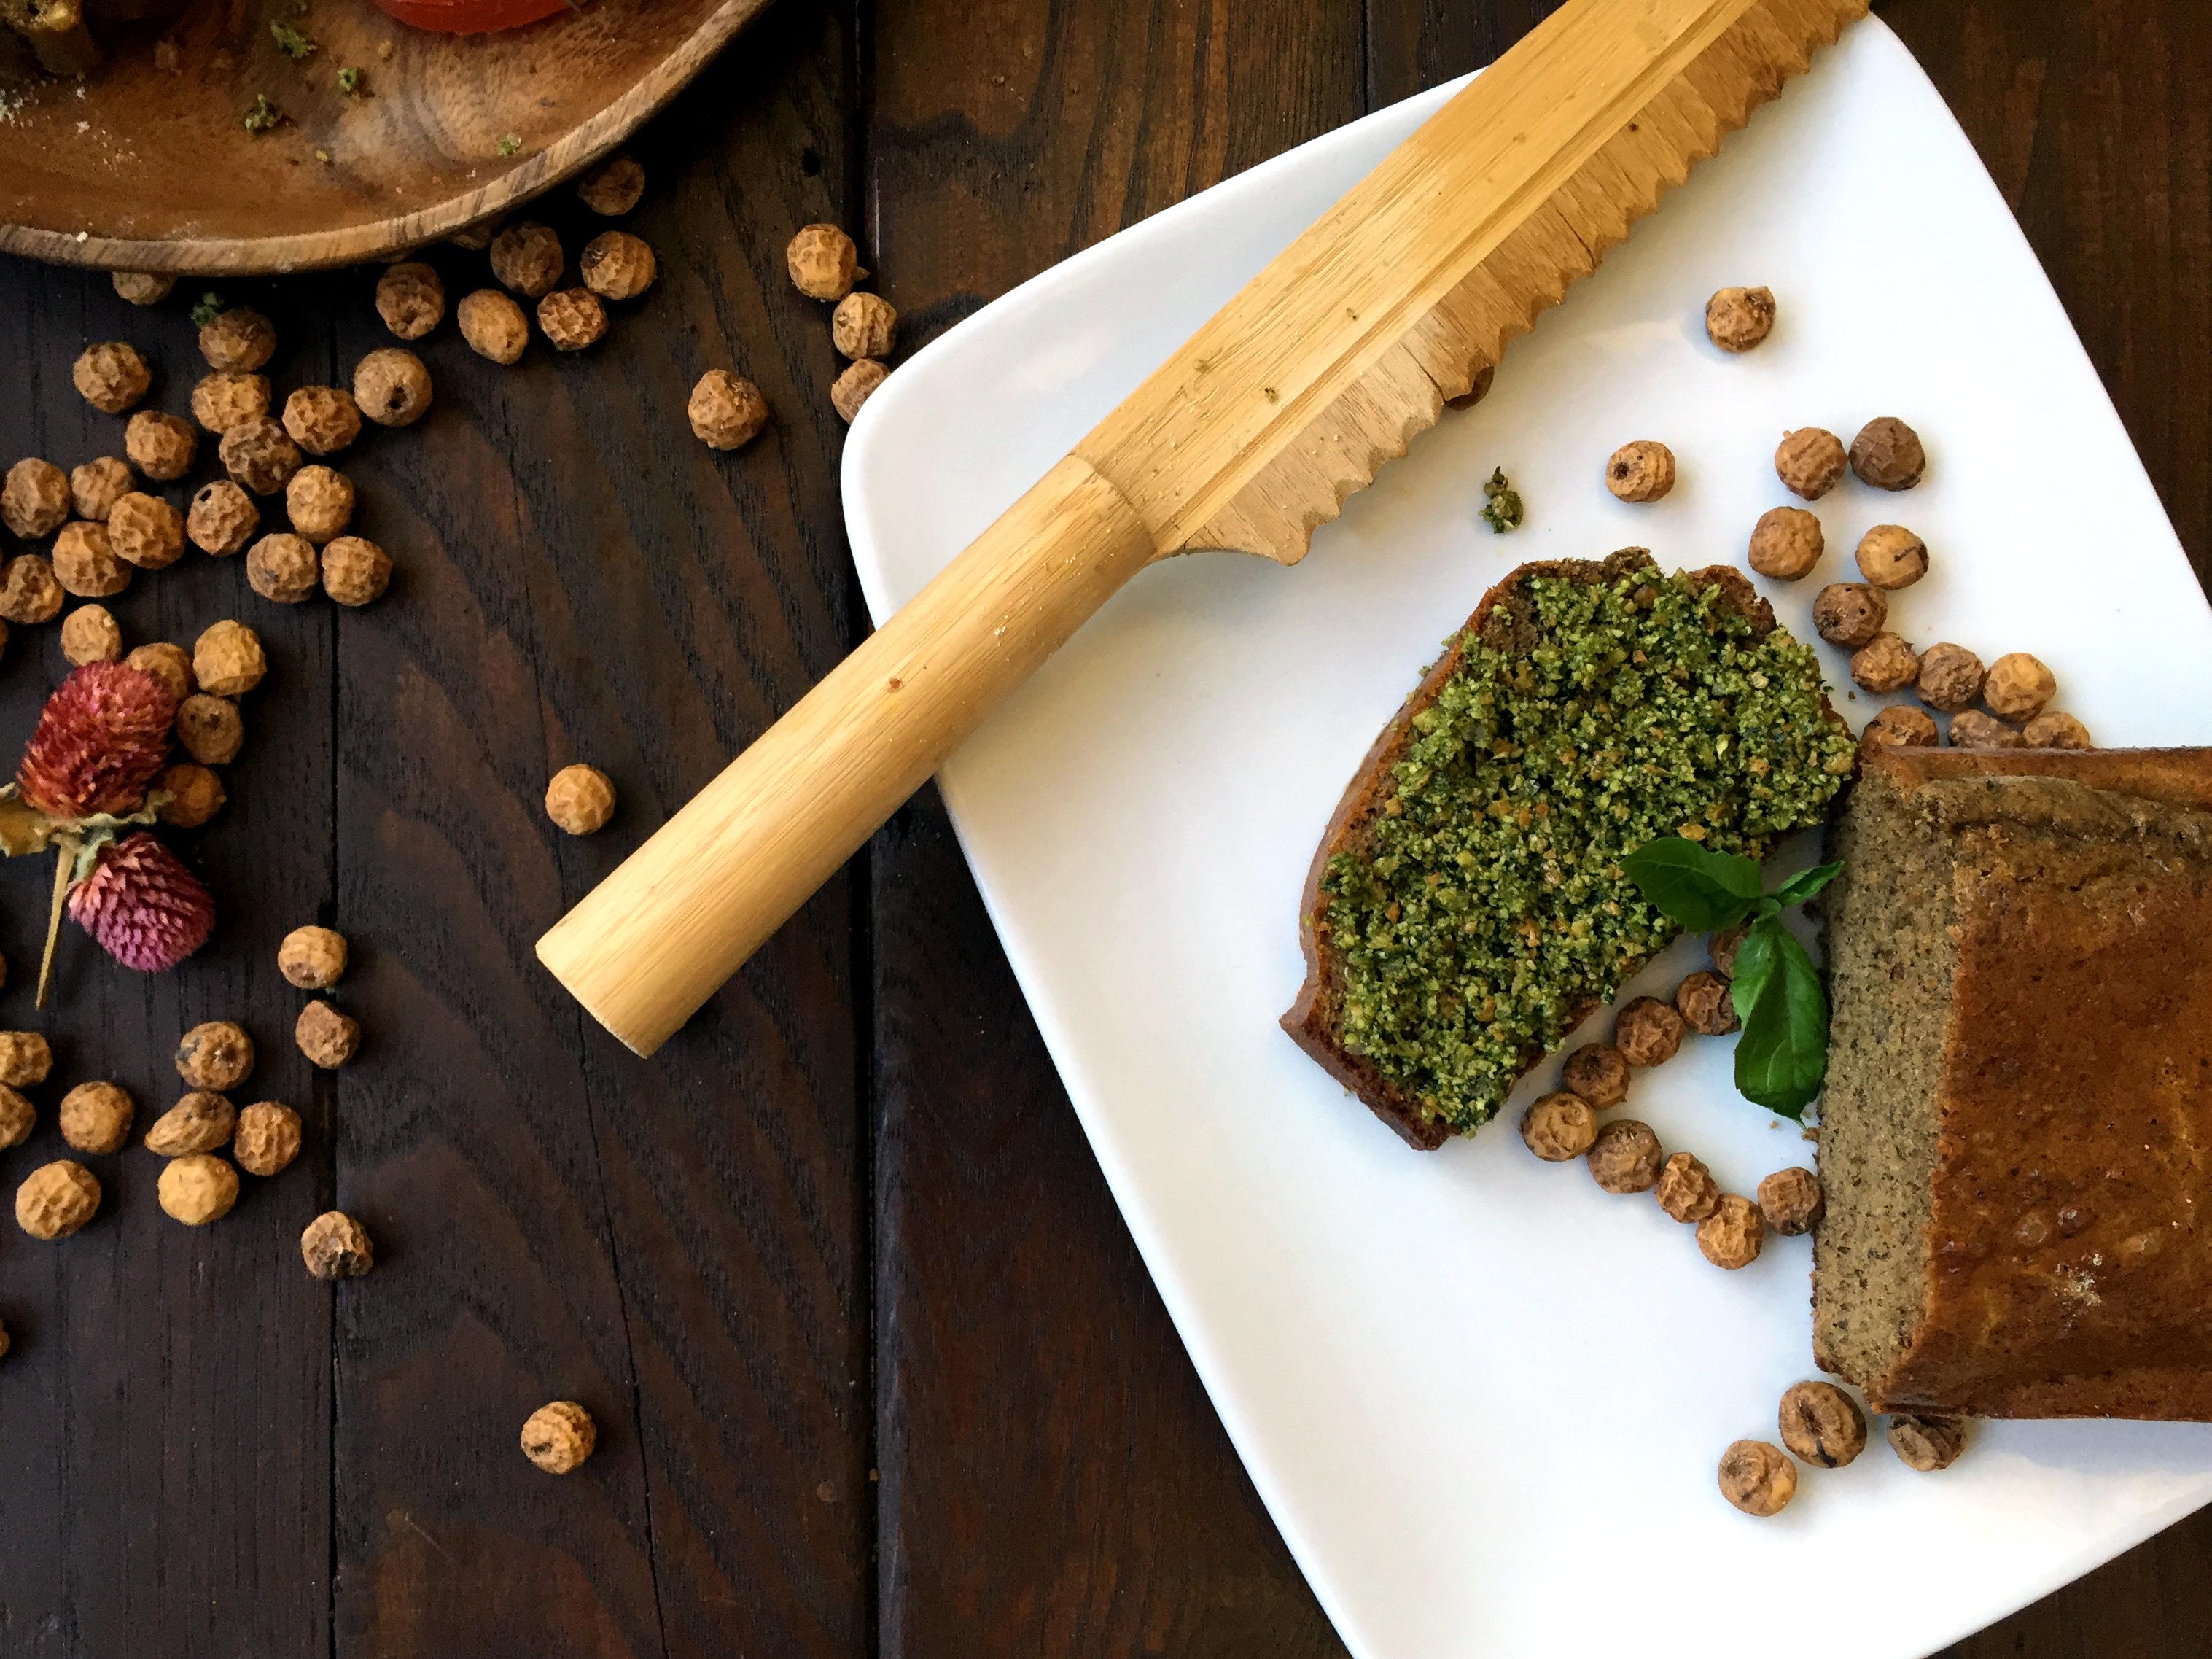 Picnic Time Paleo and Gluten-Free Bread